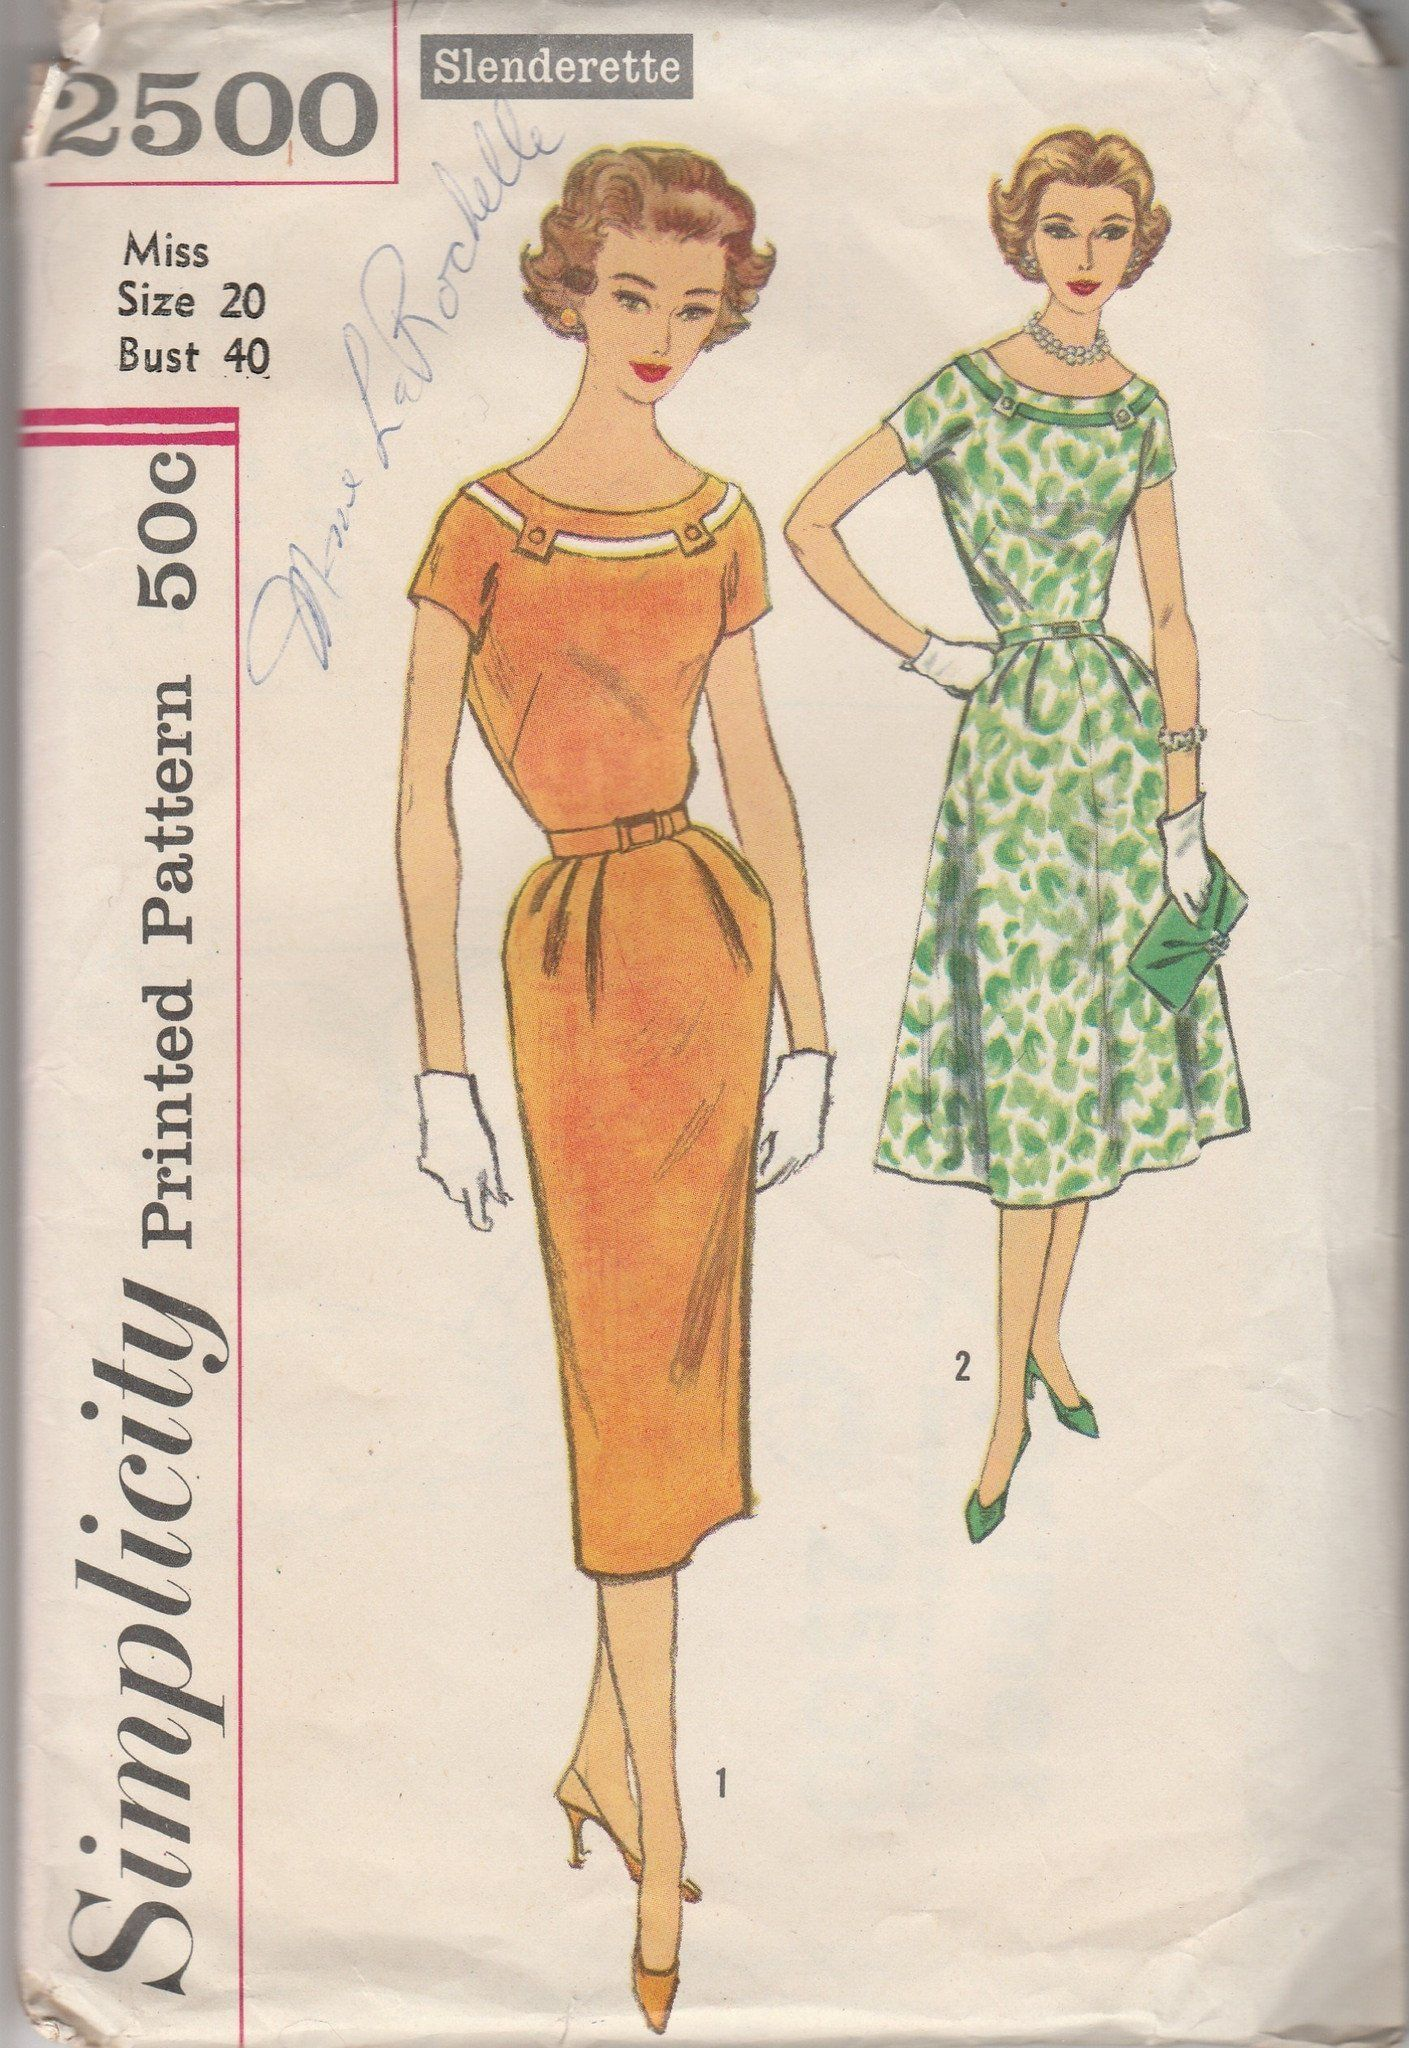 Simplicity 2500 ladies sheath dress vintage 1950s sewing pattern simplicity 2500 ladies sheath dress vintage 1950s sewing pattern slenderette jeuxipadfo Choice Image